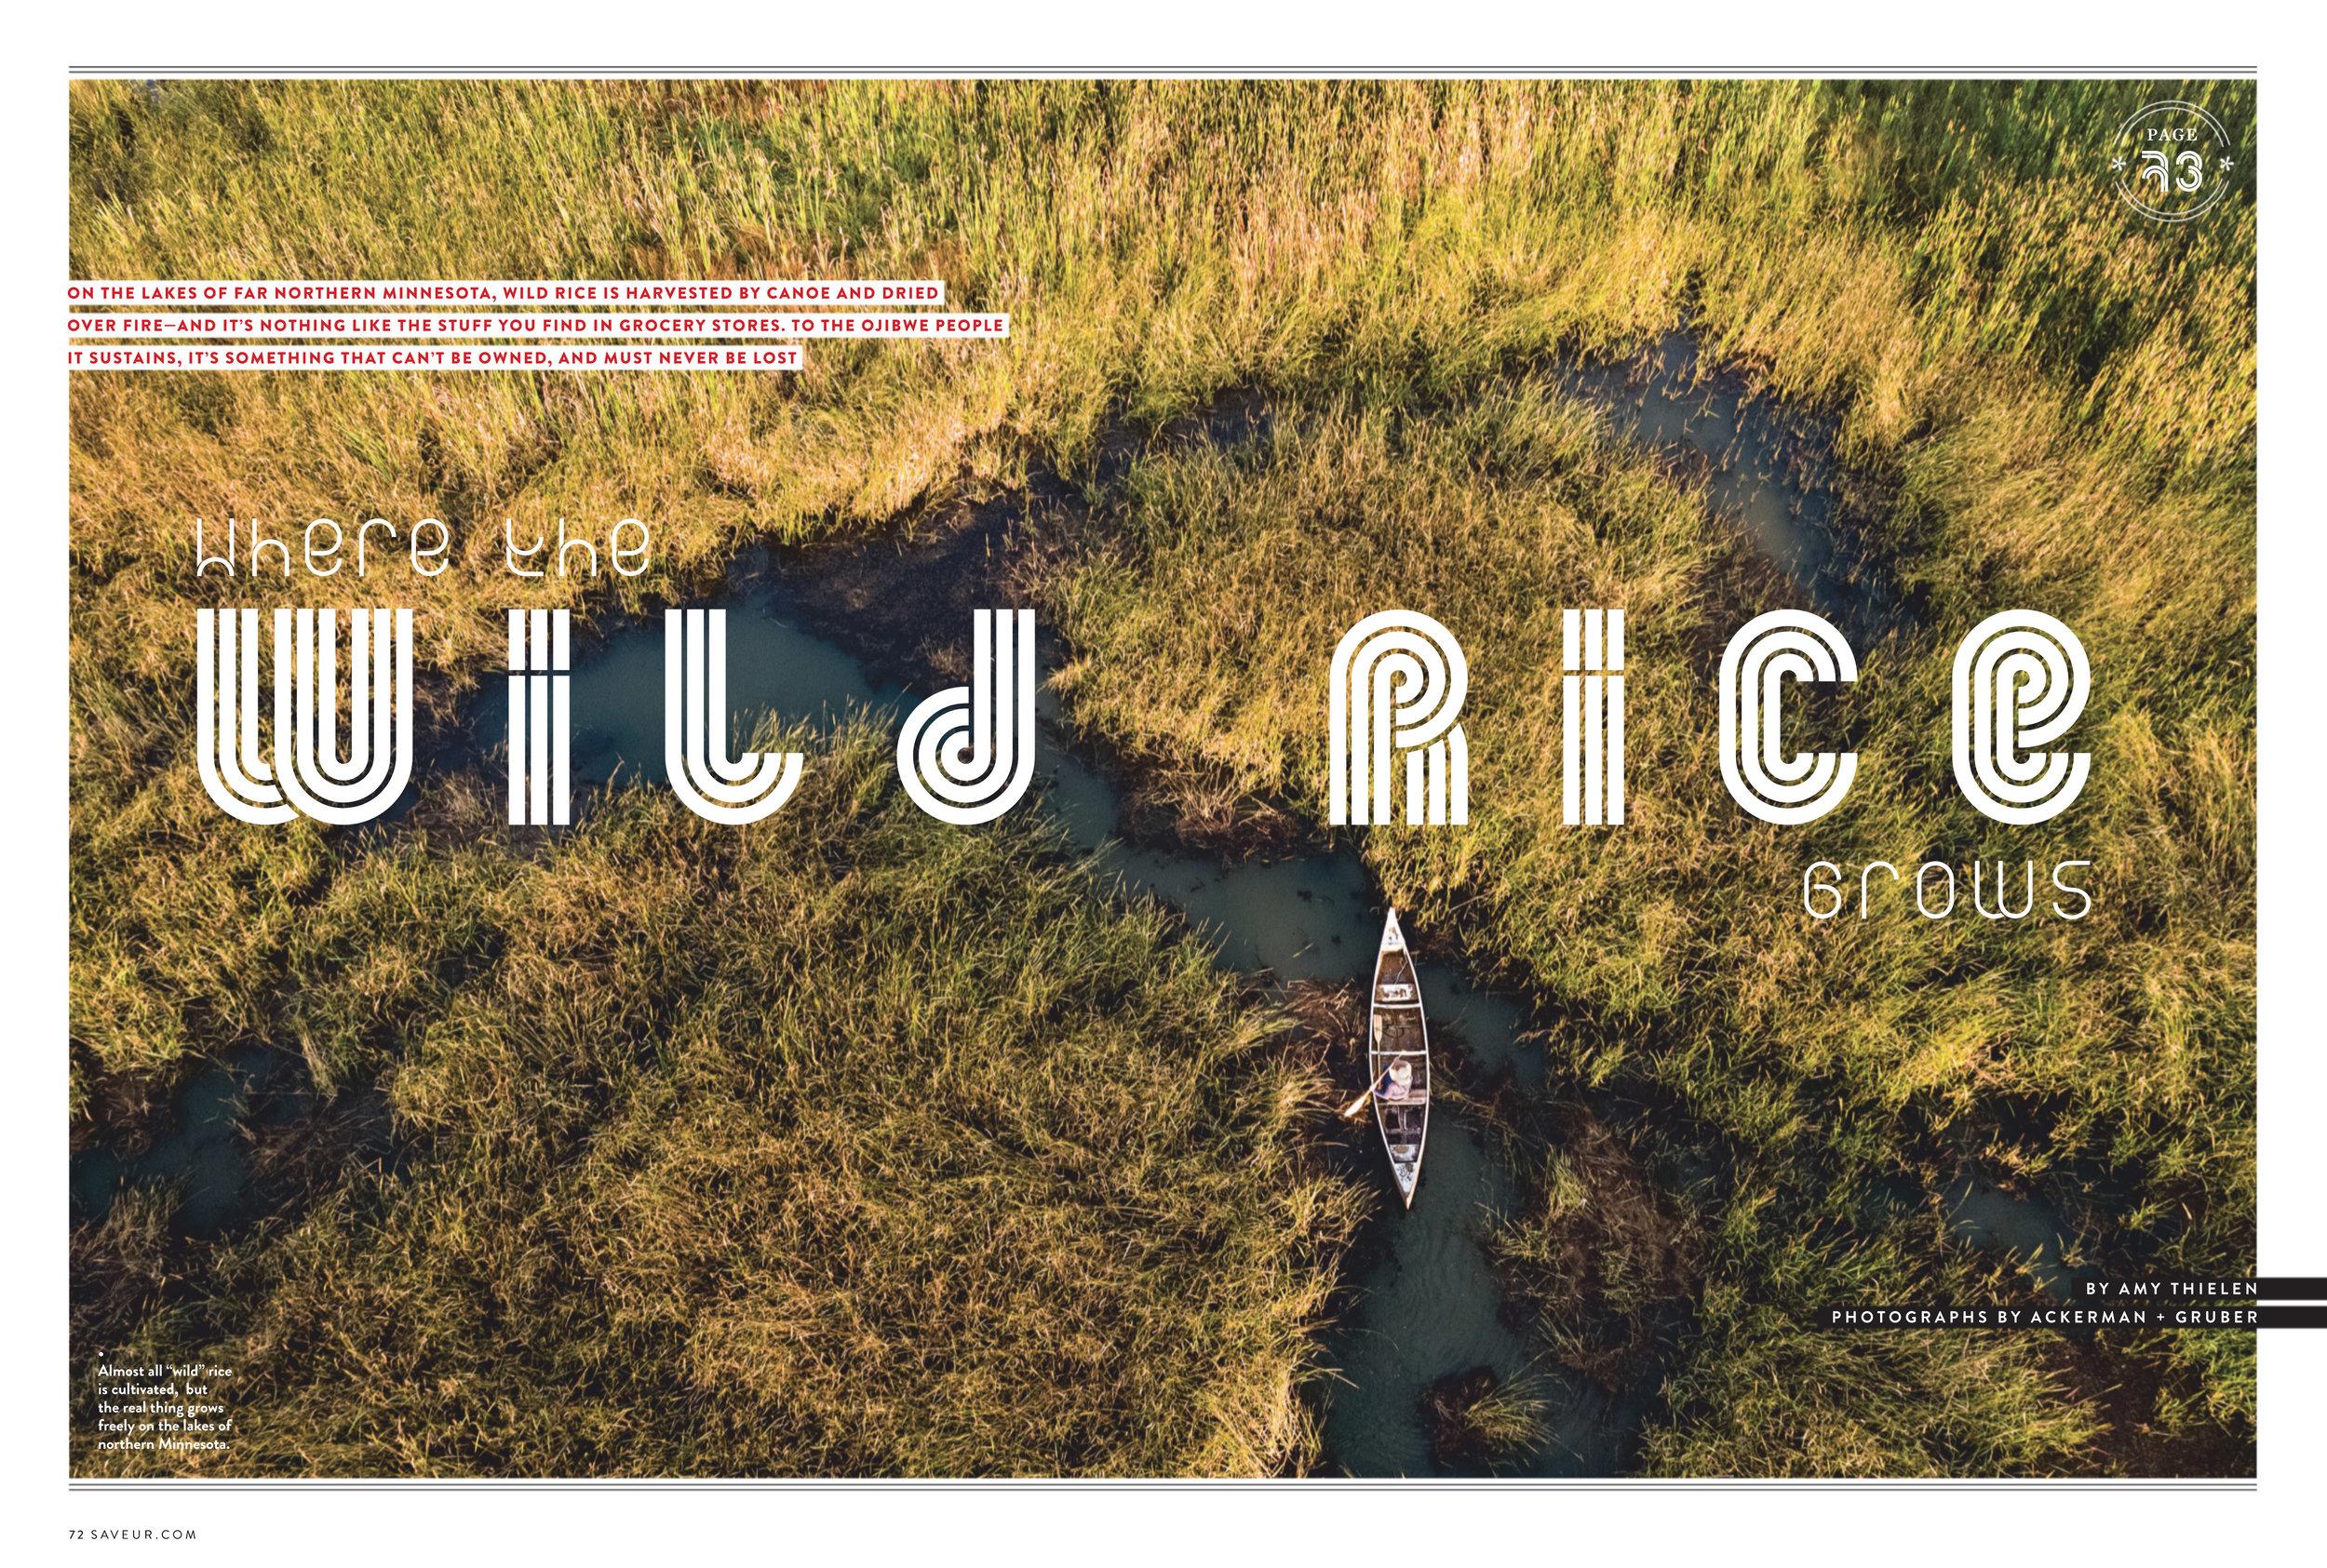 WildRice01.jpg